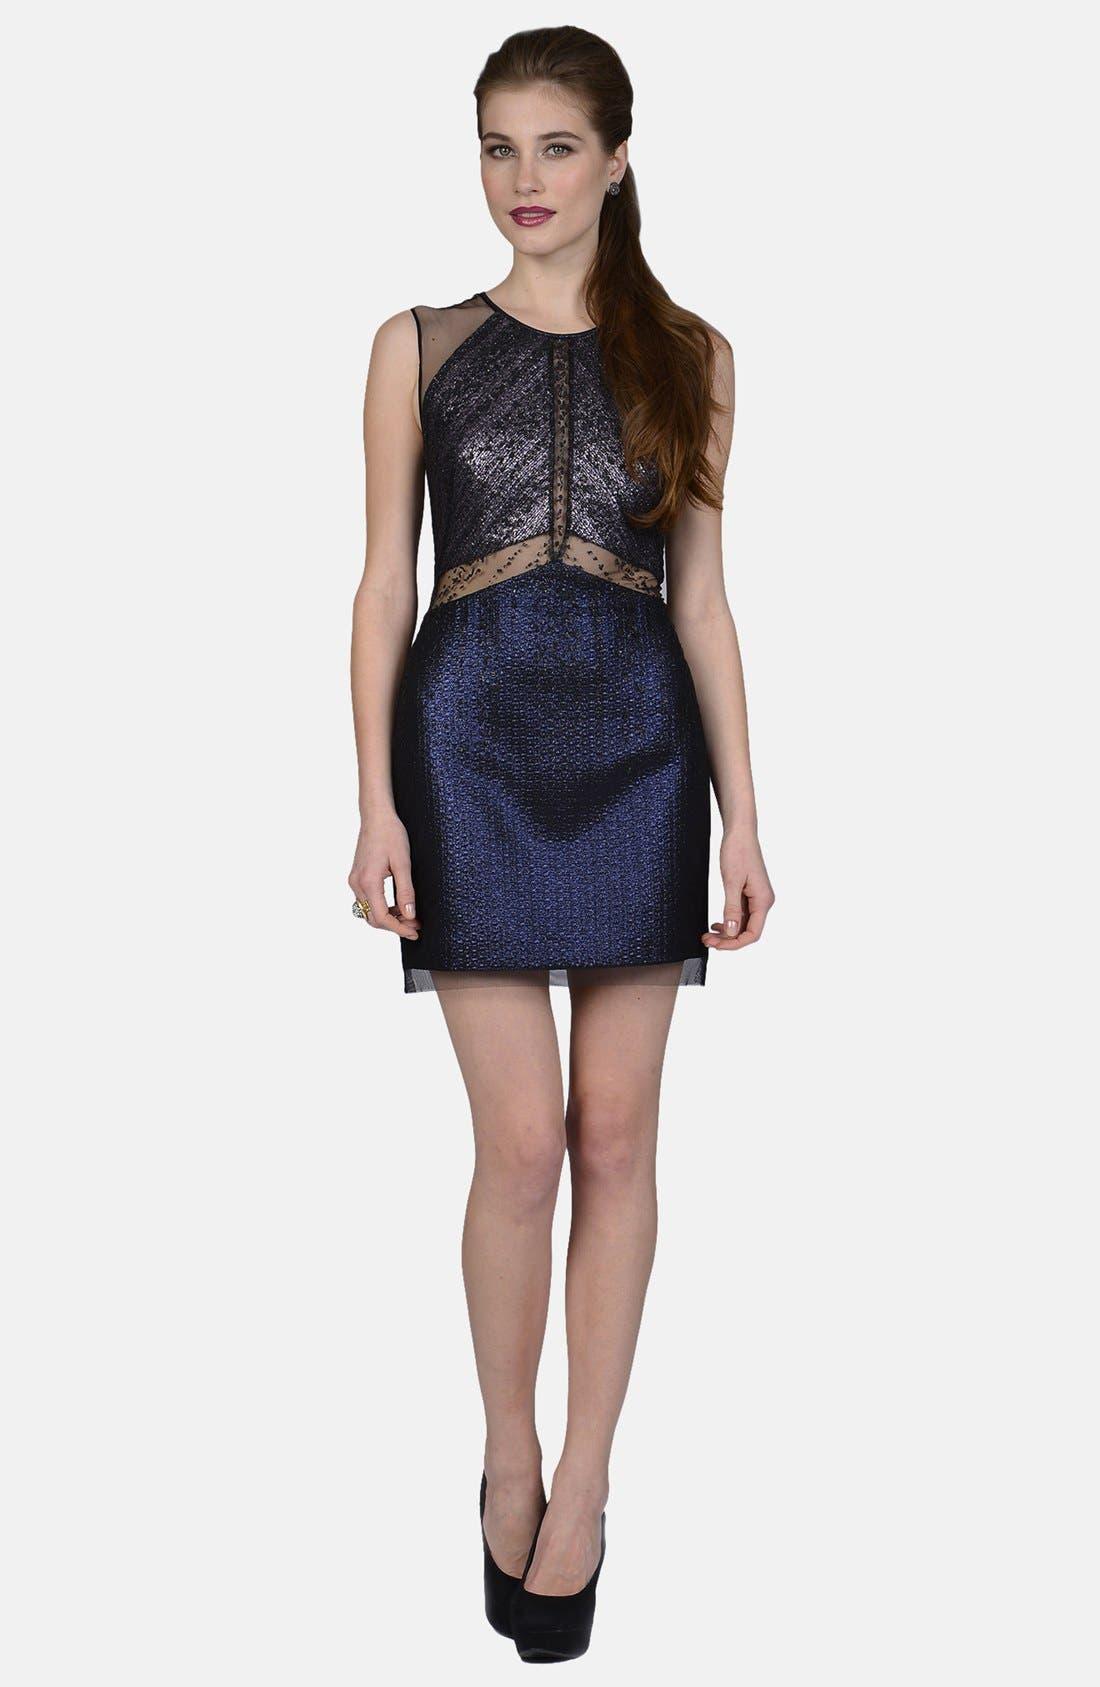 Alternate Image 1 Selected - Phoebe by Kay Unger Mixed Media Sheath Dress